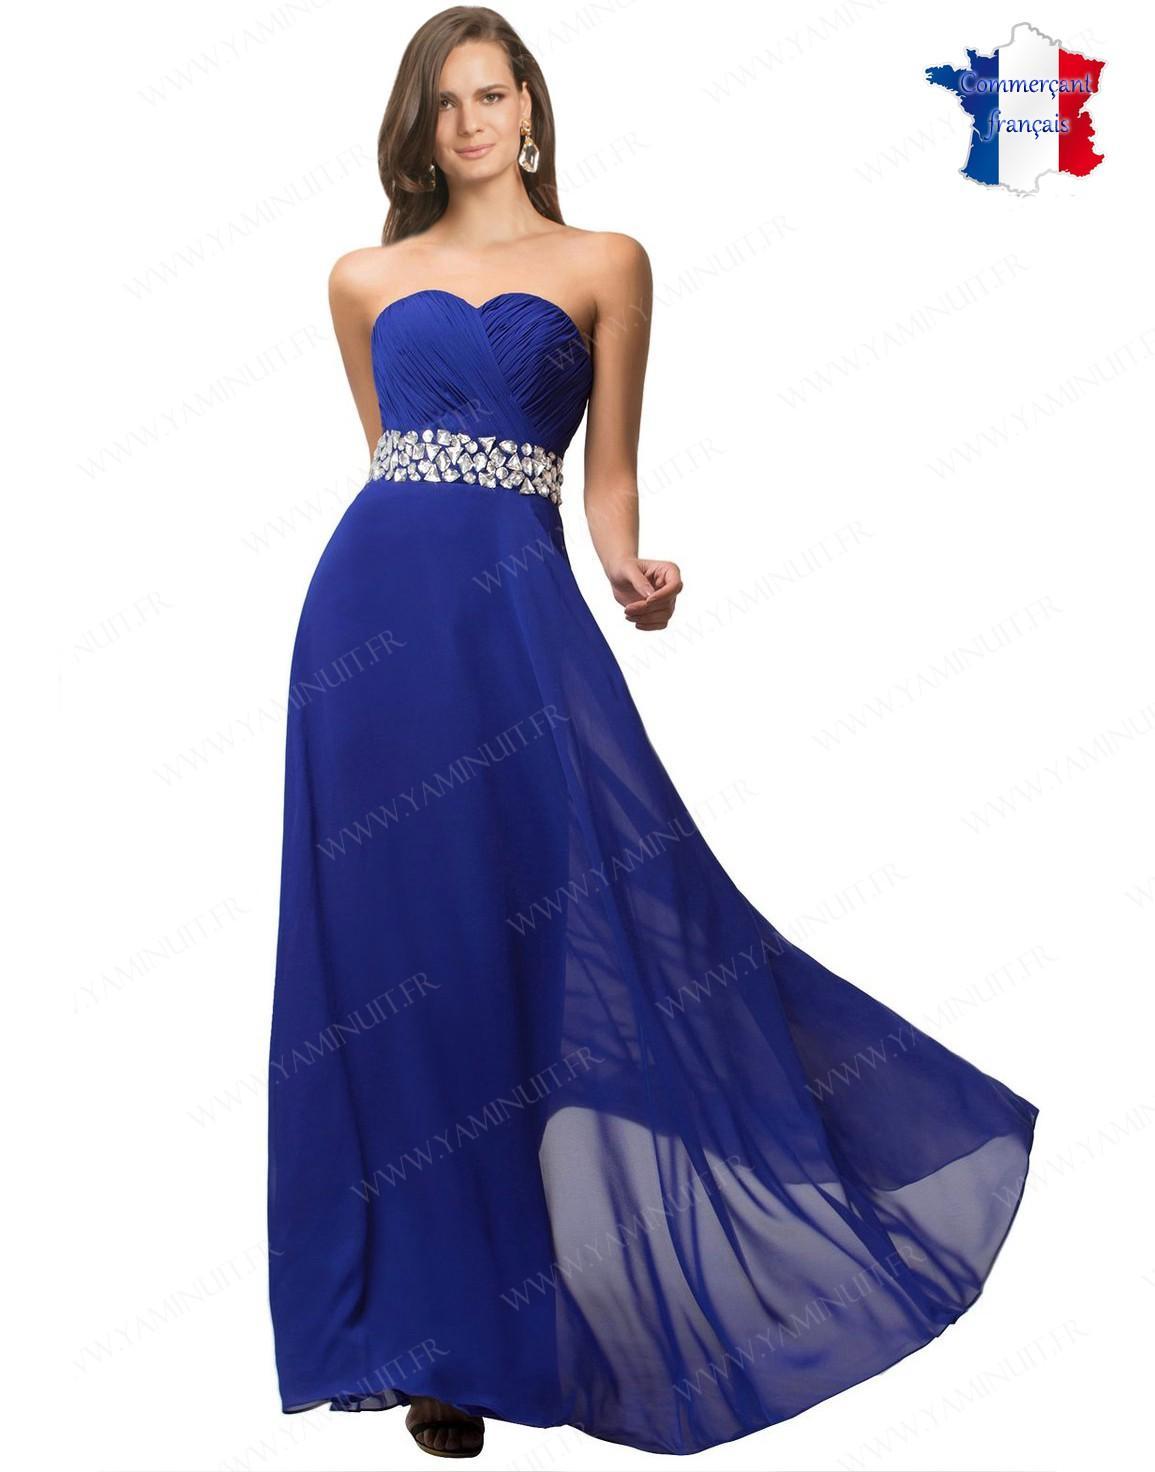 Robe couleur bleu roi